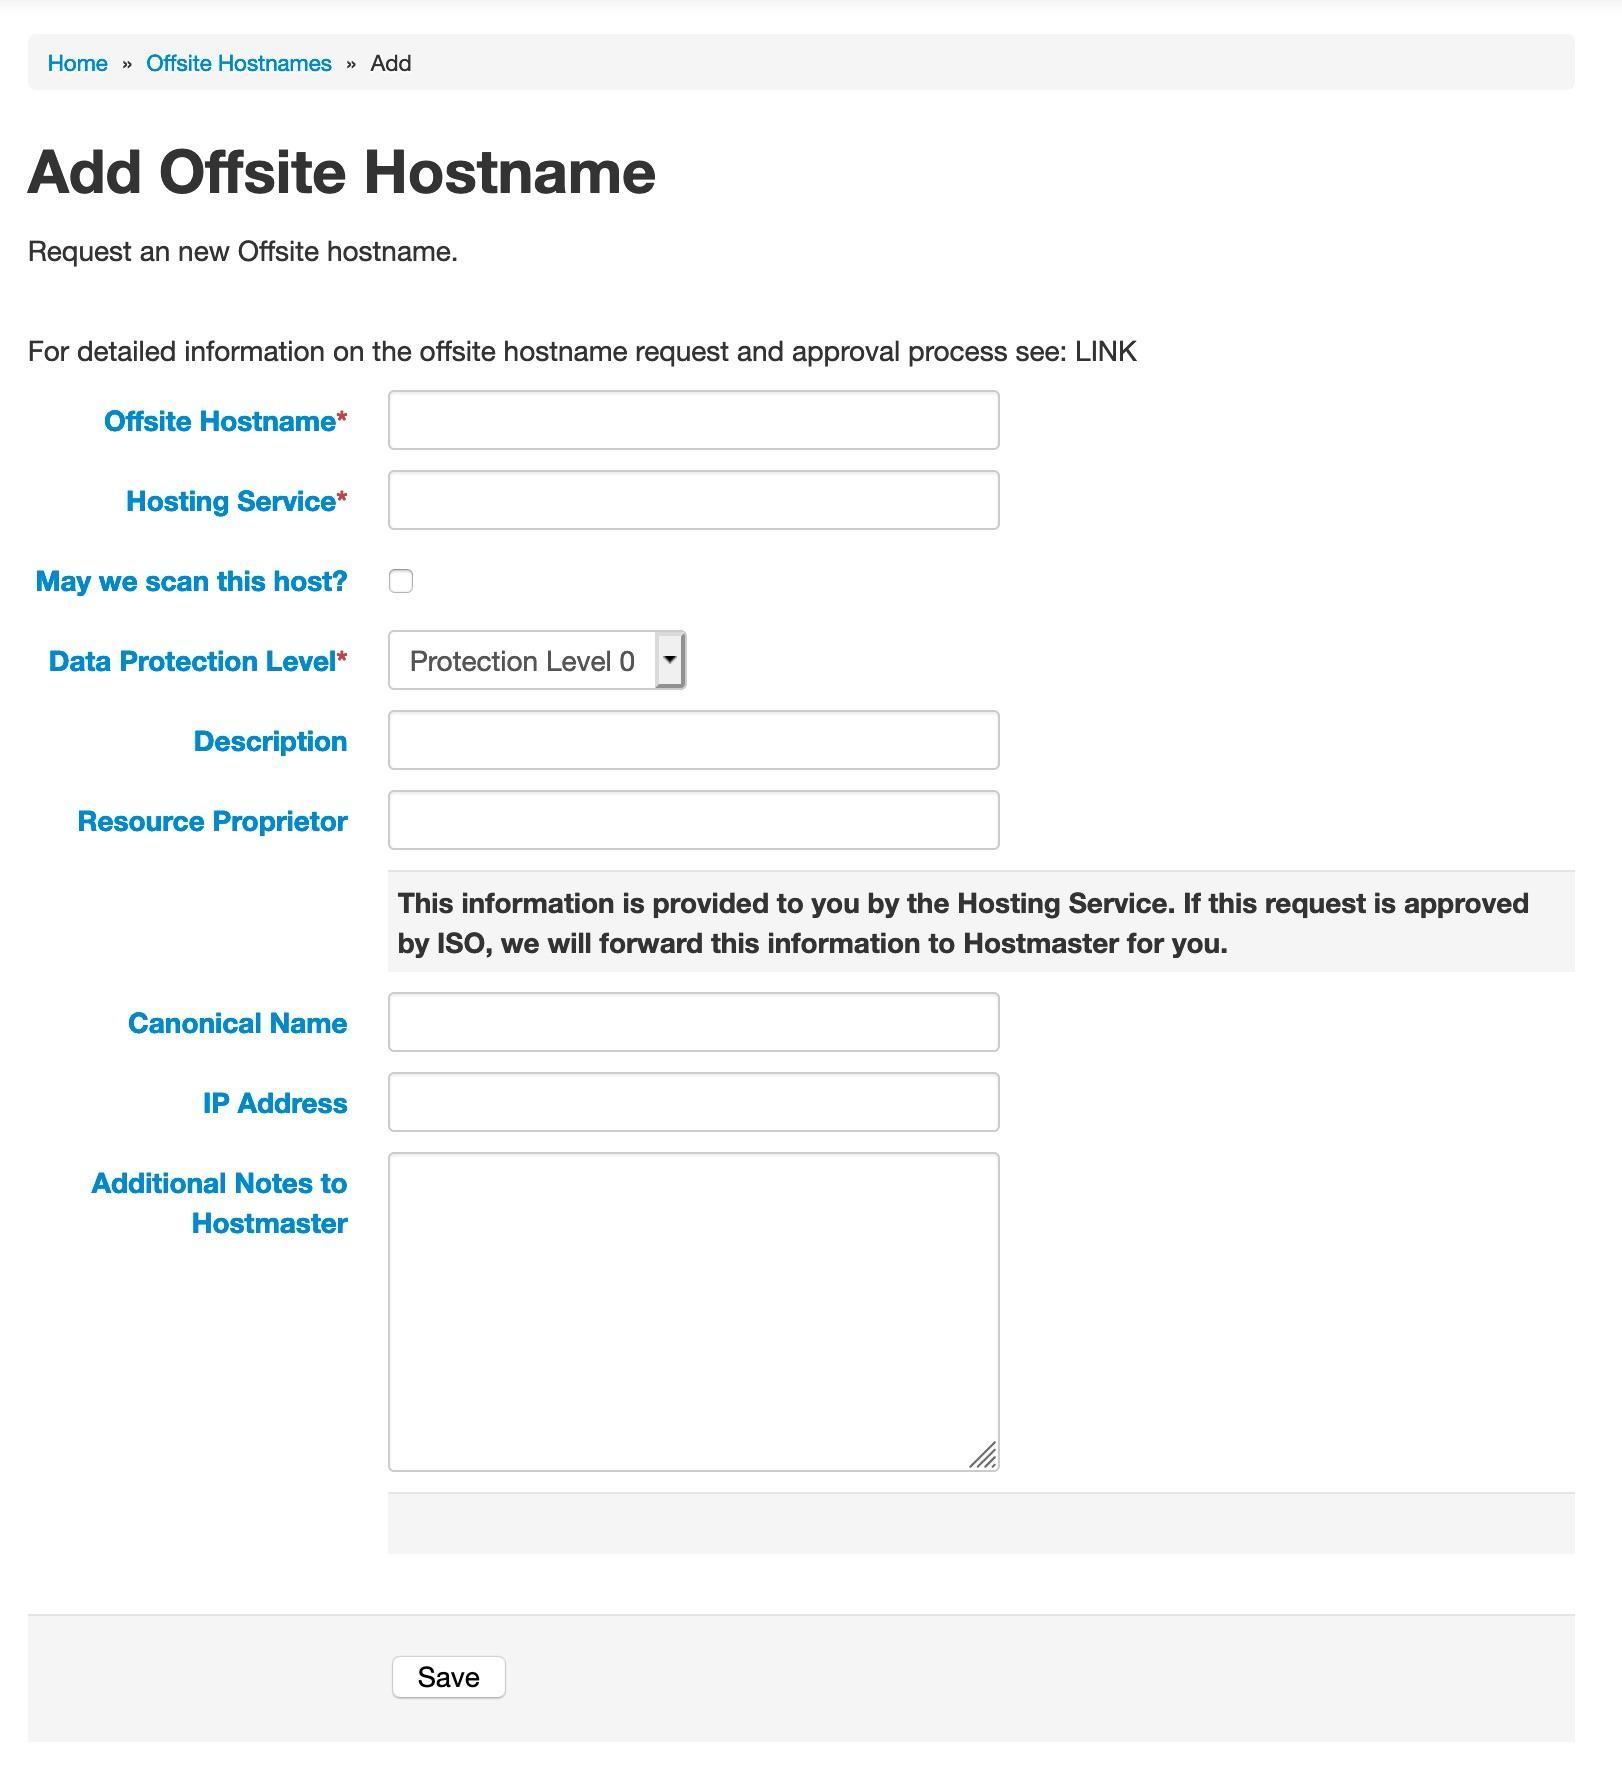 Add Offsite Hostname form